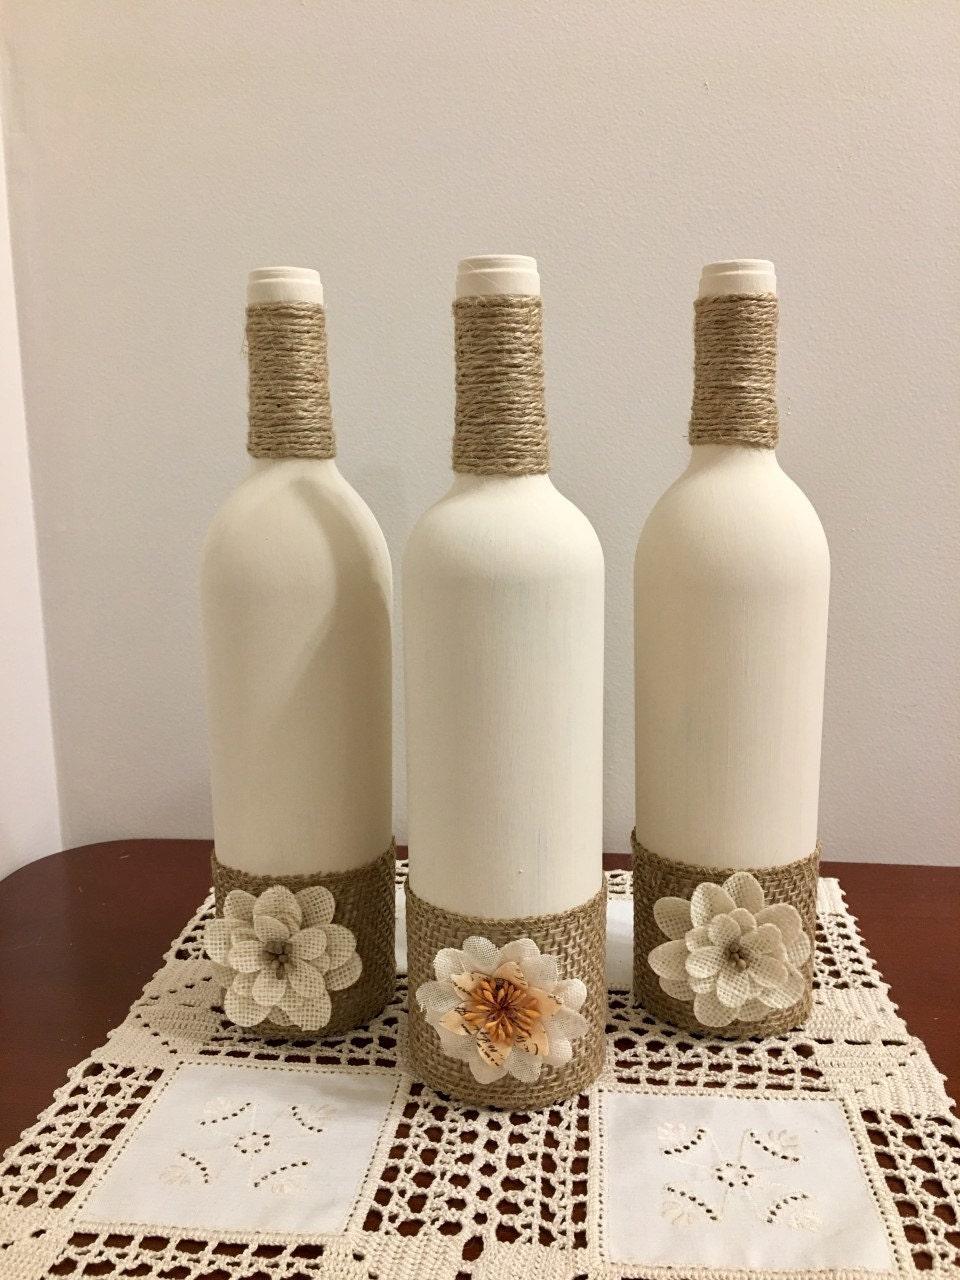 Mesa de vino botella home decor decoraci n r stico hogar for Decoracion hogar rustico